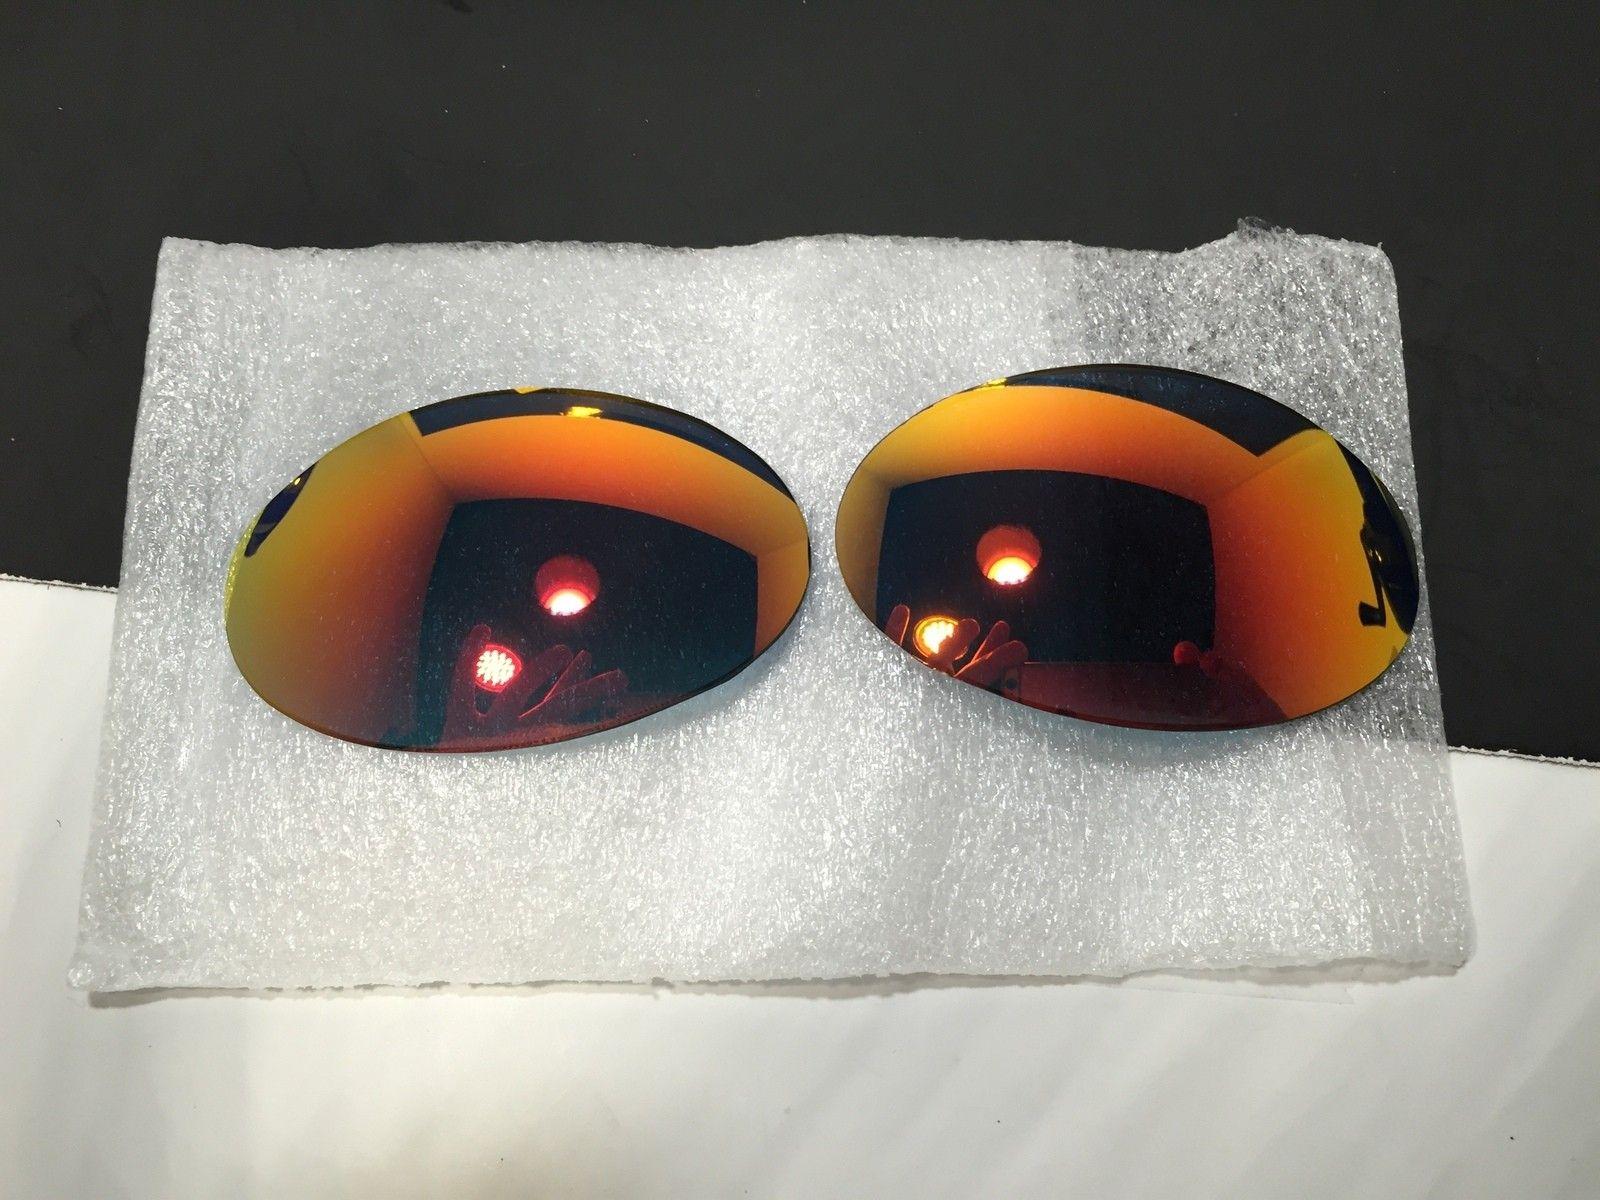 Custom Lenses Romeo 1 Ruby and Juliet Pos Red both New - IMG_1824_2.JPG